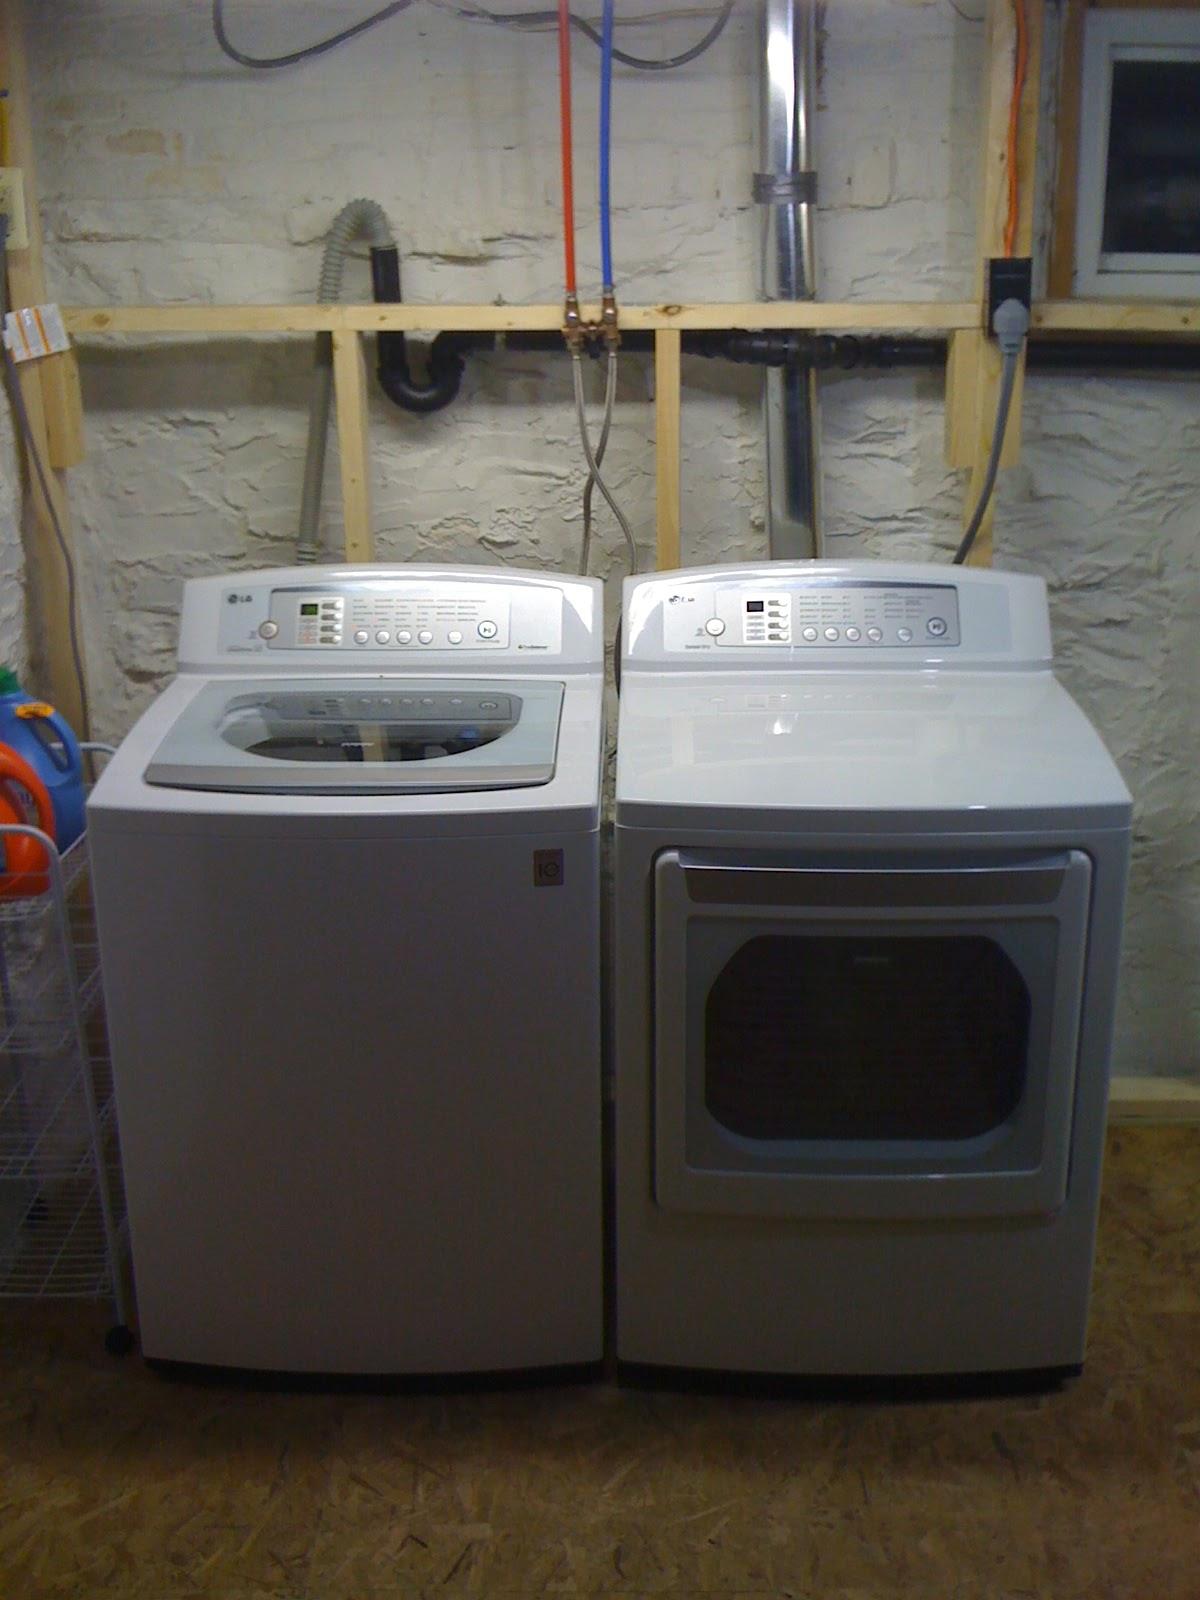 whirlpool dryer just beeps residential water softener hook up diagram thinking out loud in sturbridge december 2011